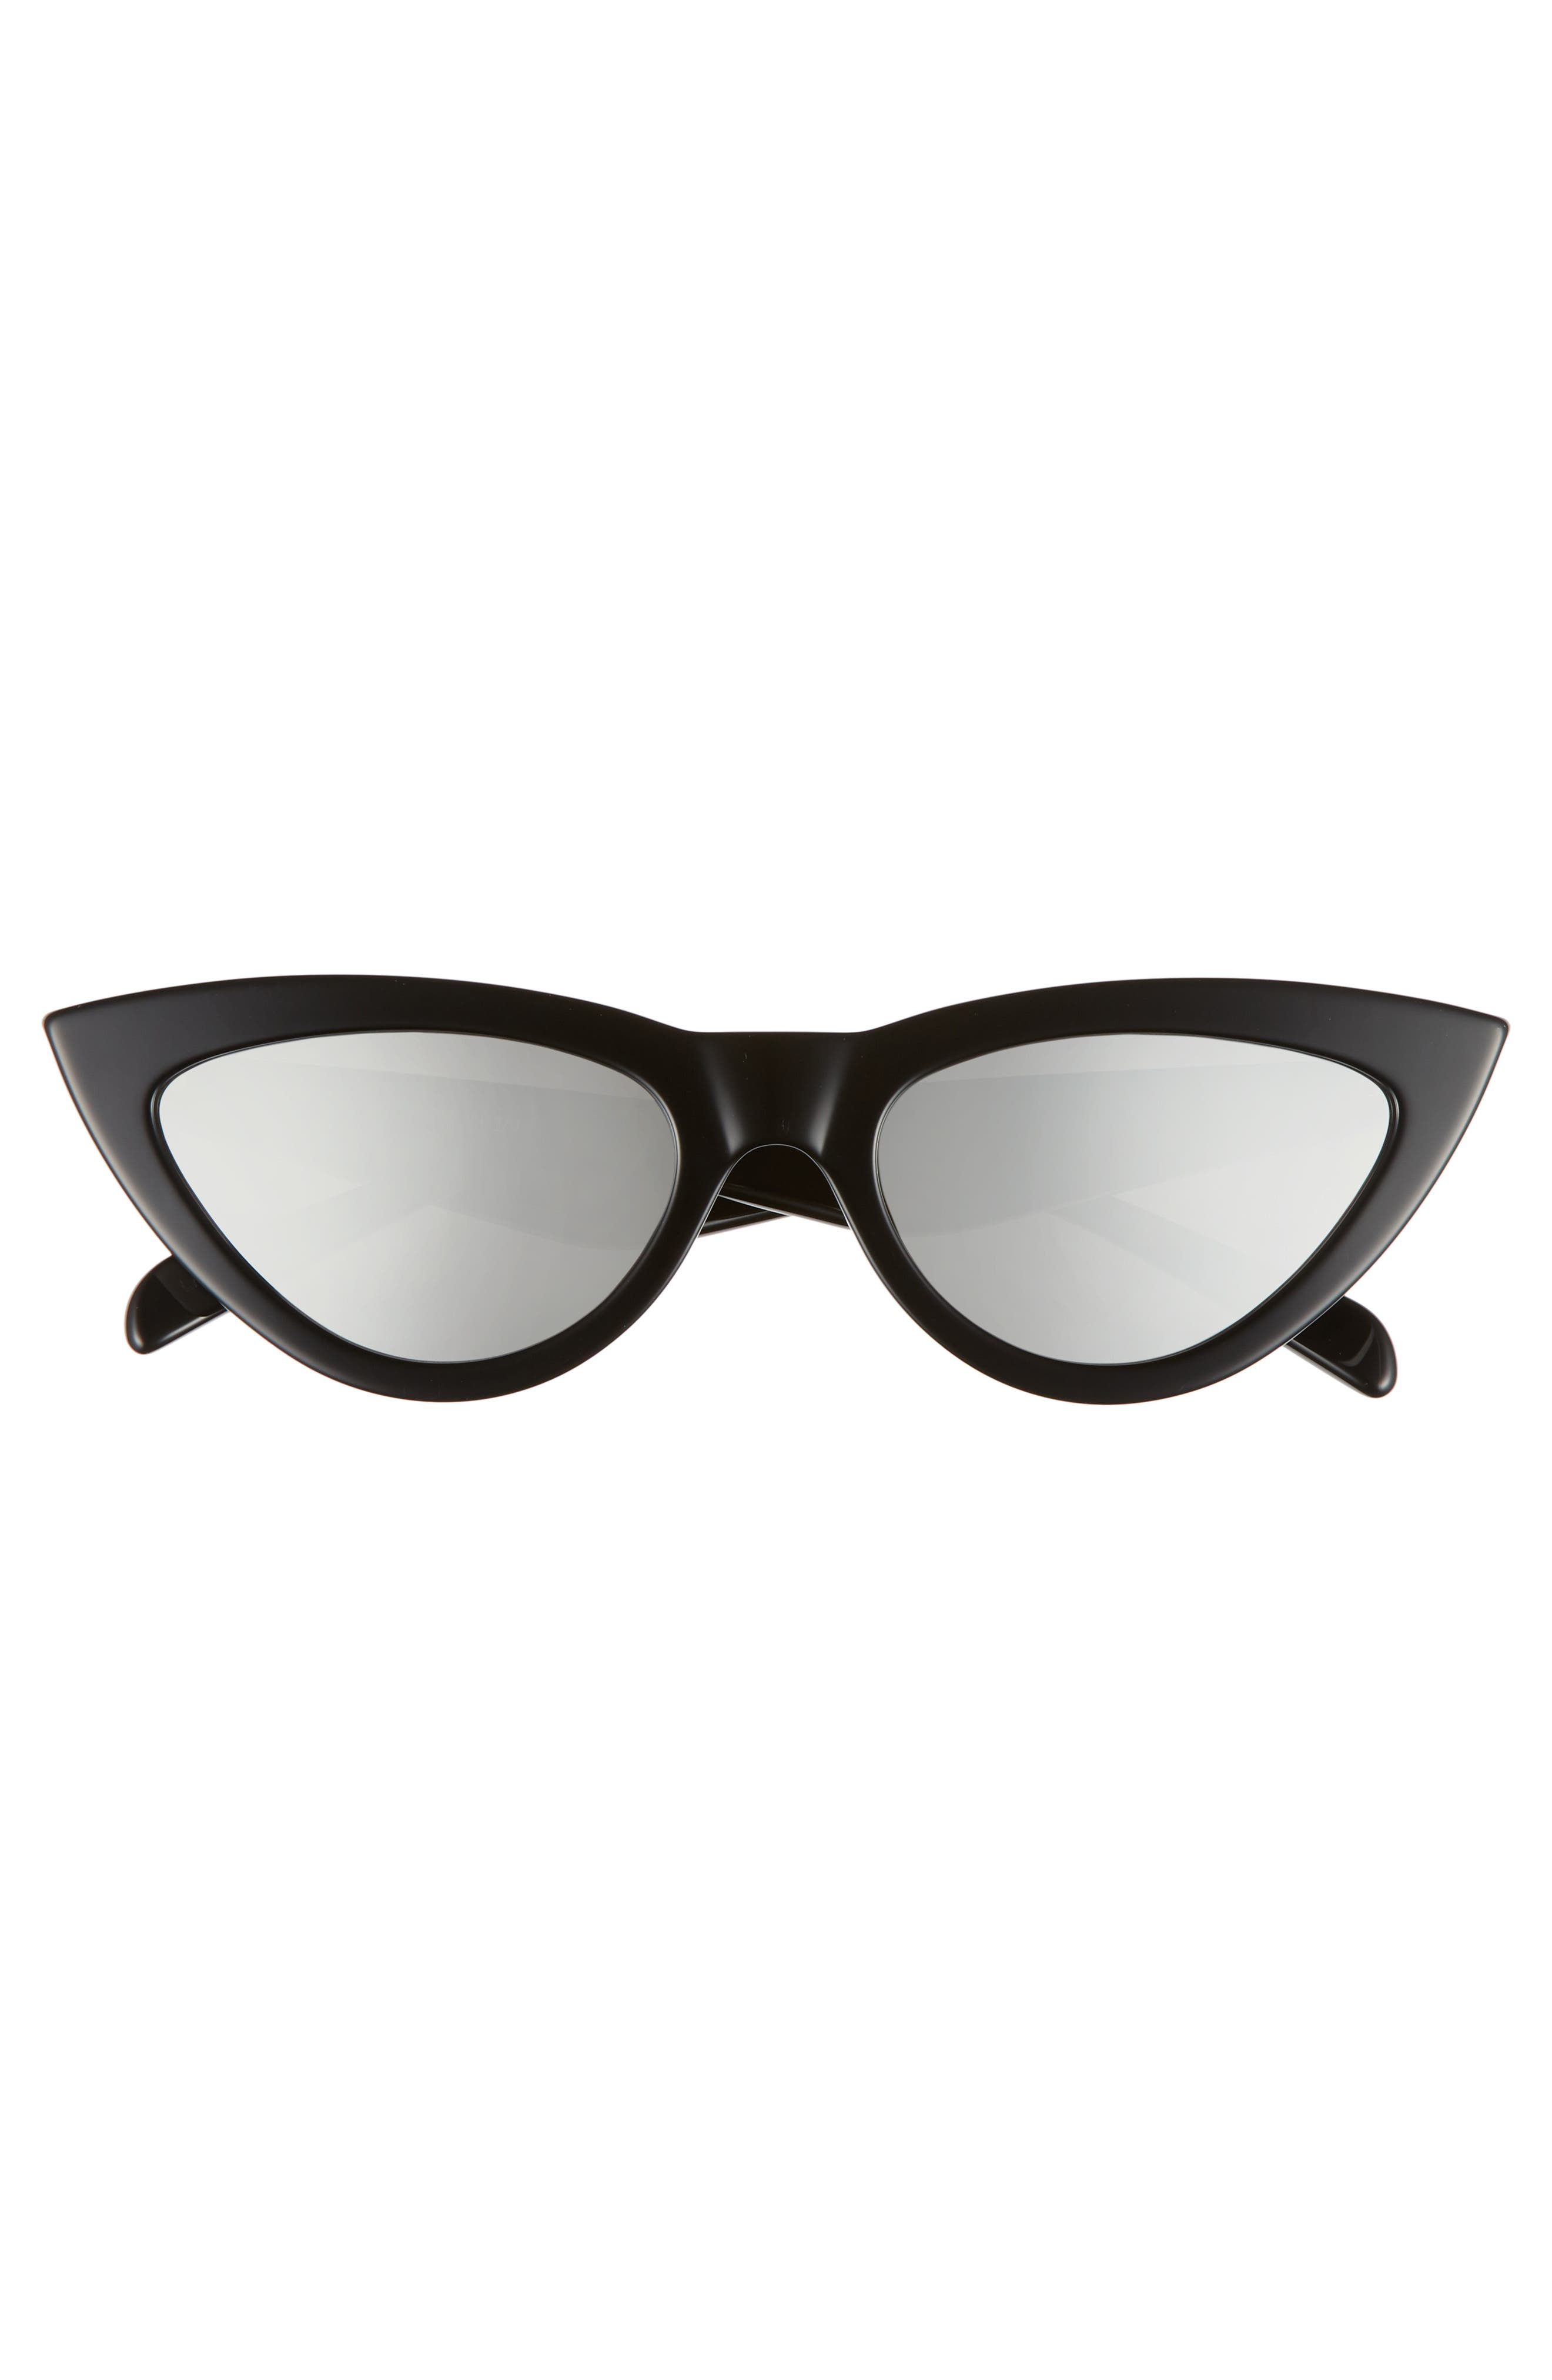 56mm Cat Eye Sunglasses,                             Alternate thumbnail 3, color,                             BLACK/ SILVER FLASH